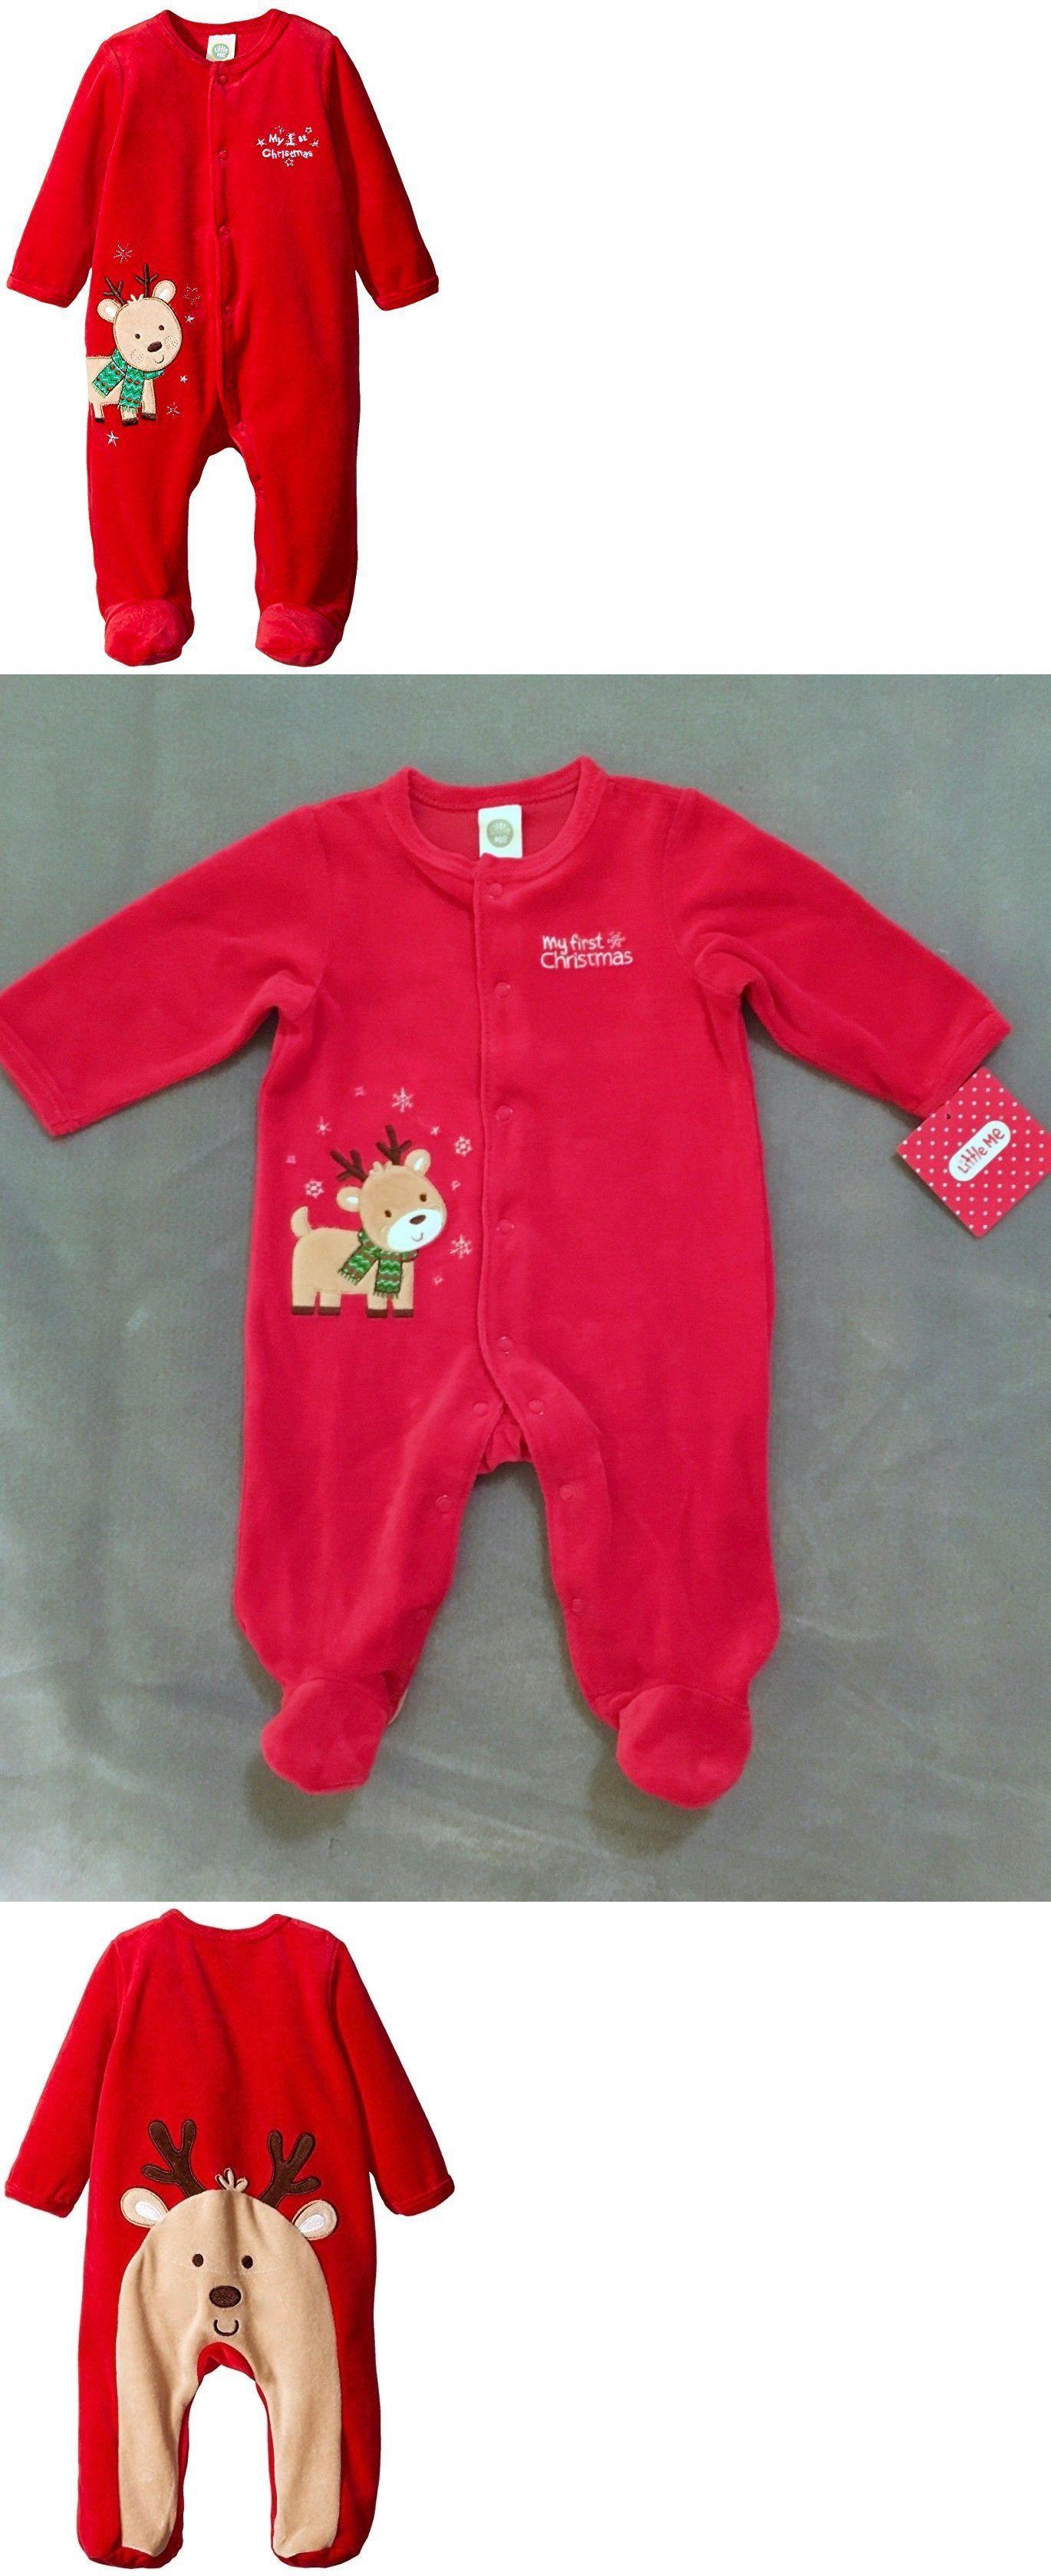 78736c6a6 Sleepwear 163400: Nwt Infant Little Me Red Velour My First Christmas Sleeper  Sleep And Play